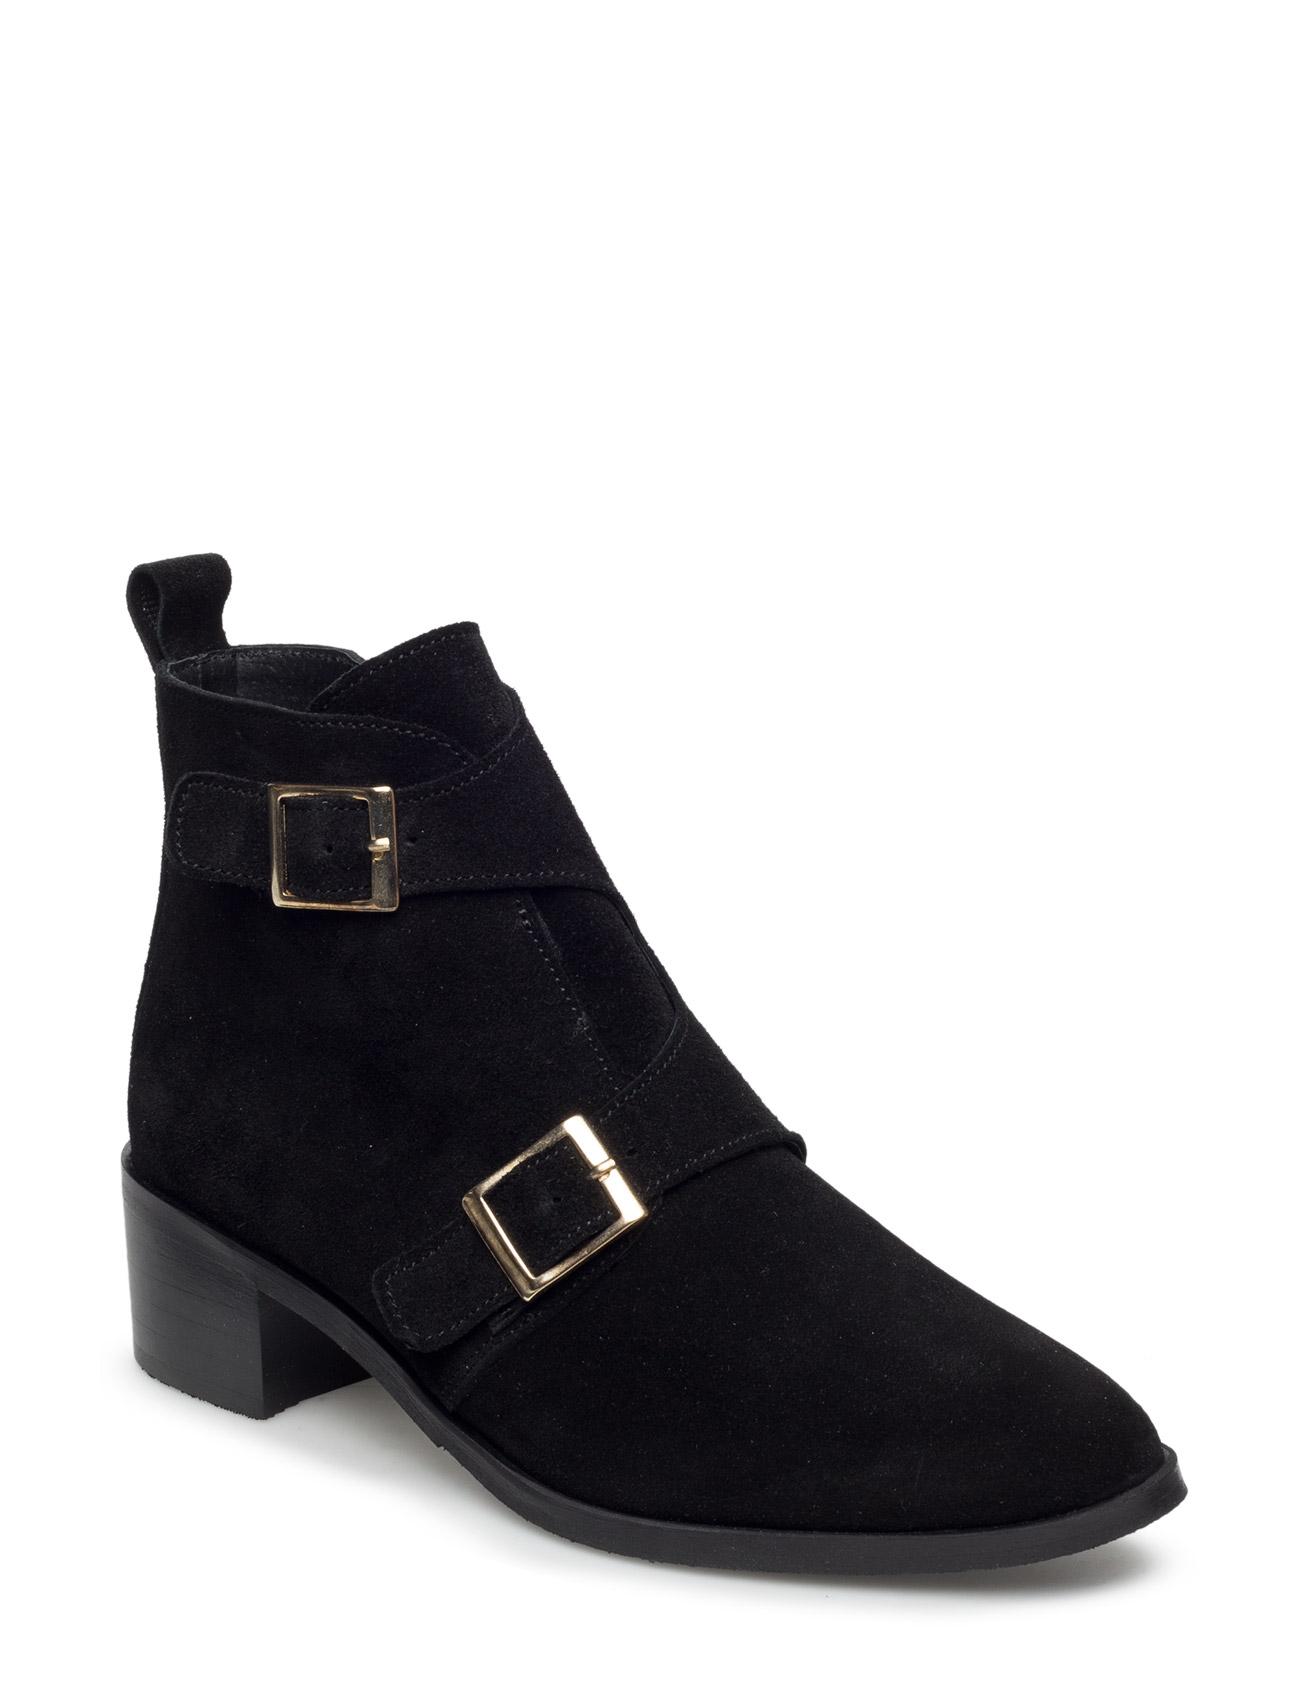 Twin Buckle Boot Son16 Bianco Støvler til Damer i Sort